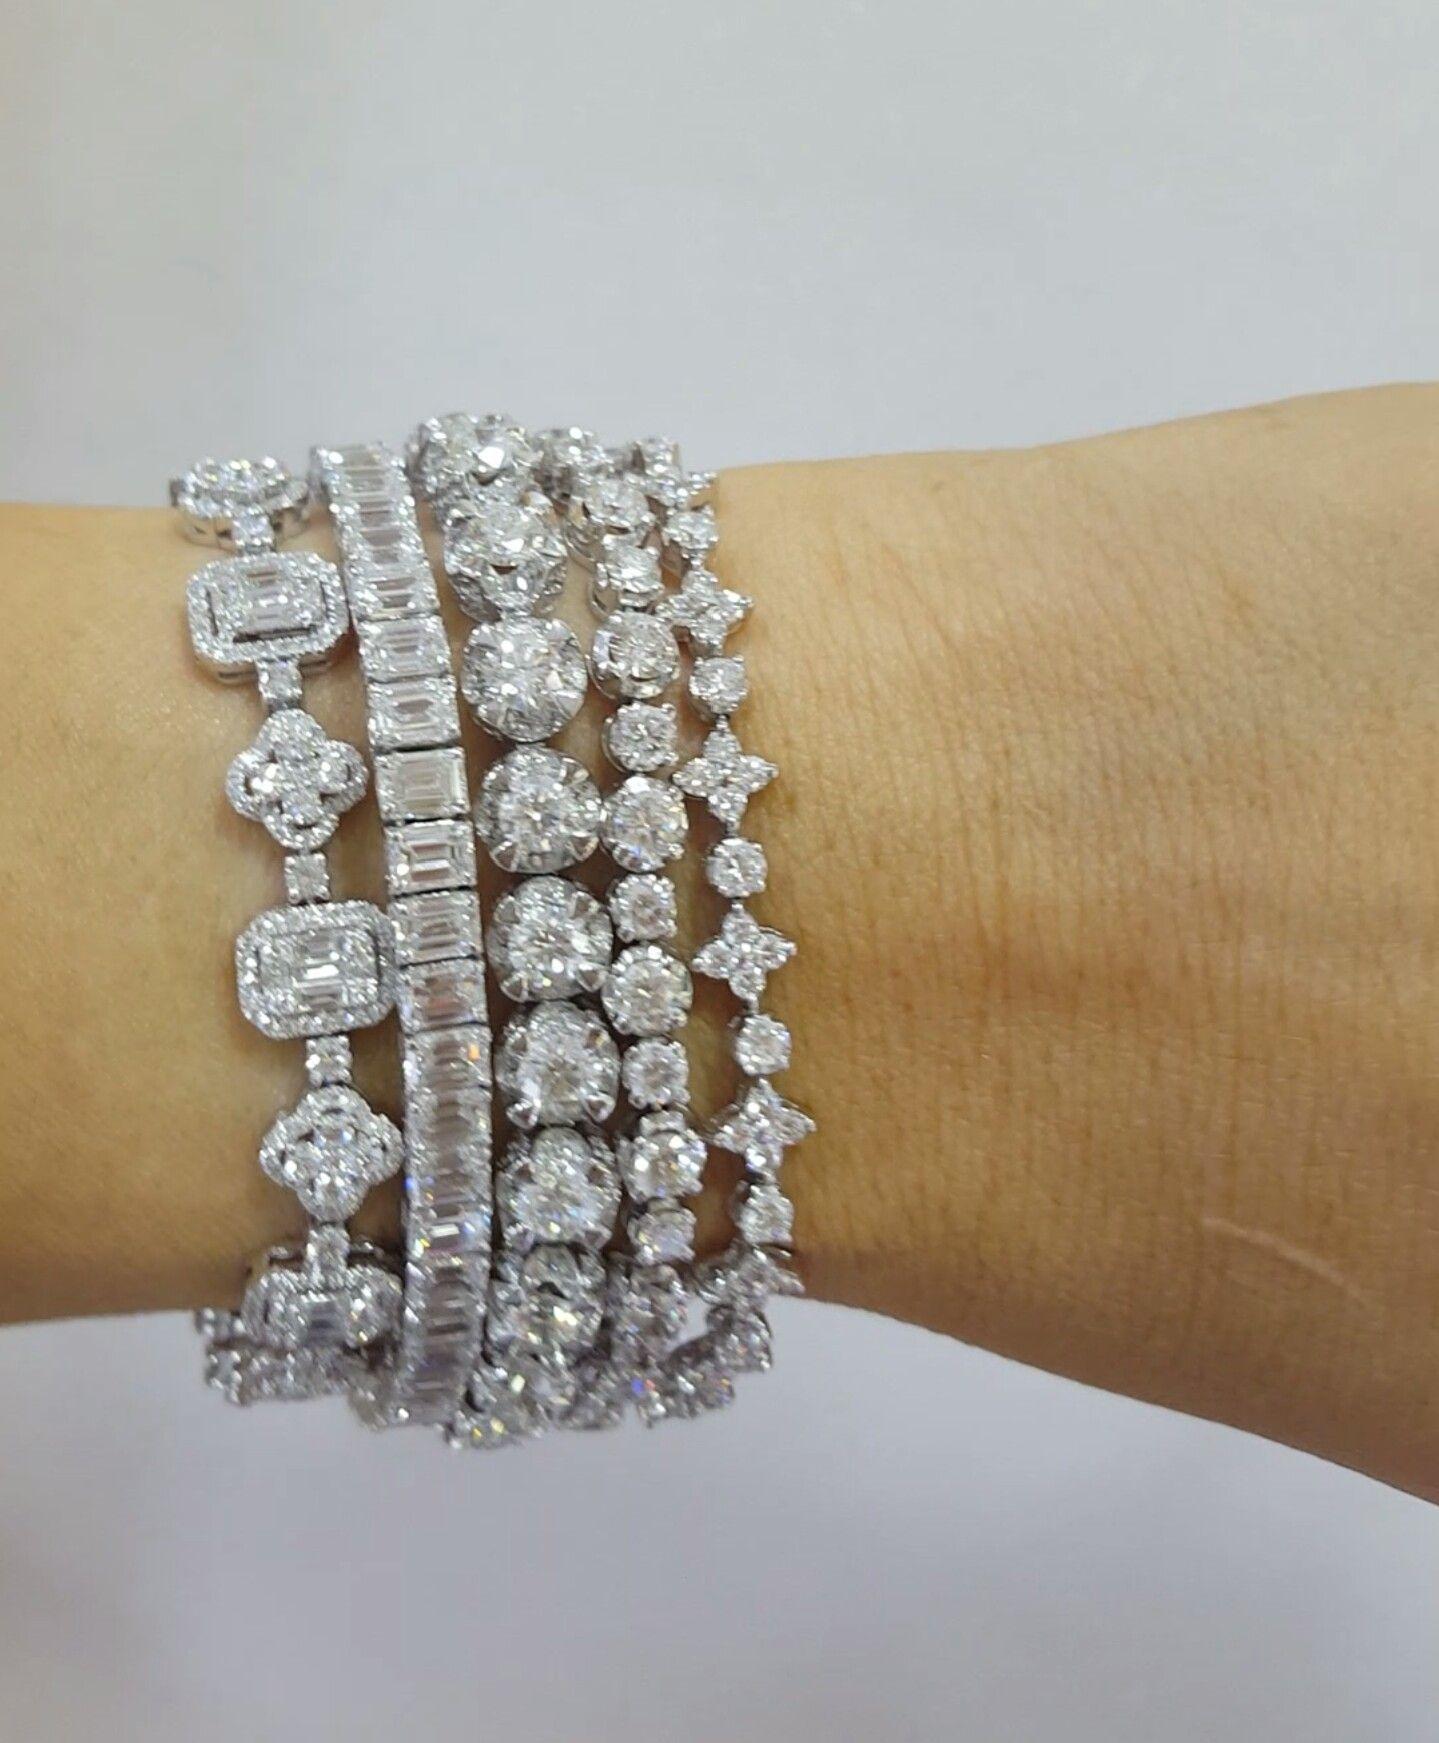 Pin by alan mcavoy on silver bracelets in pinterest diamond